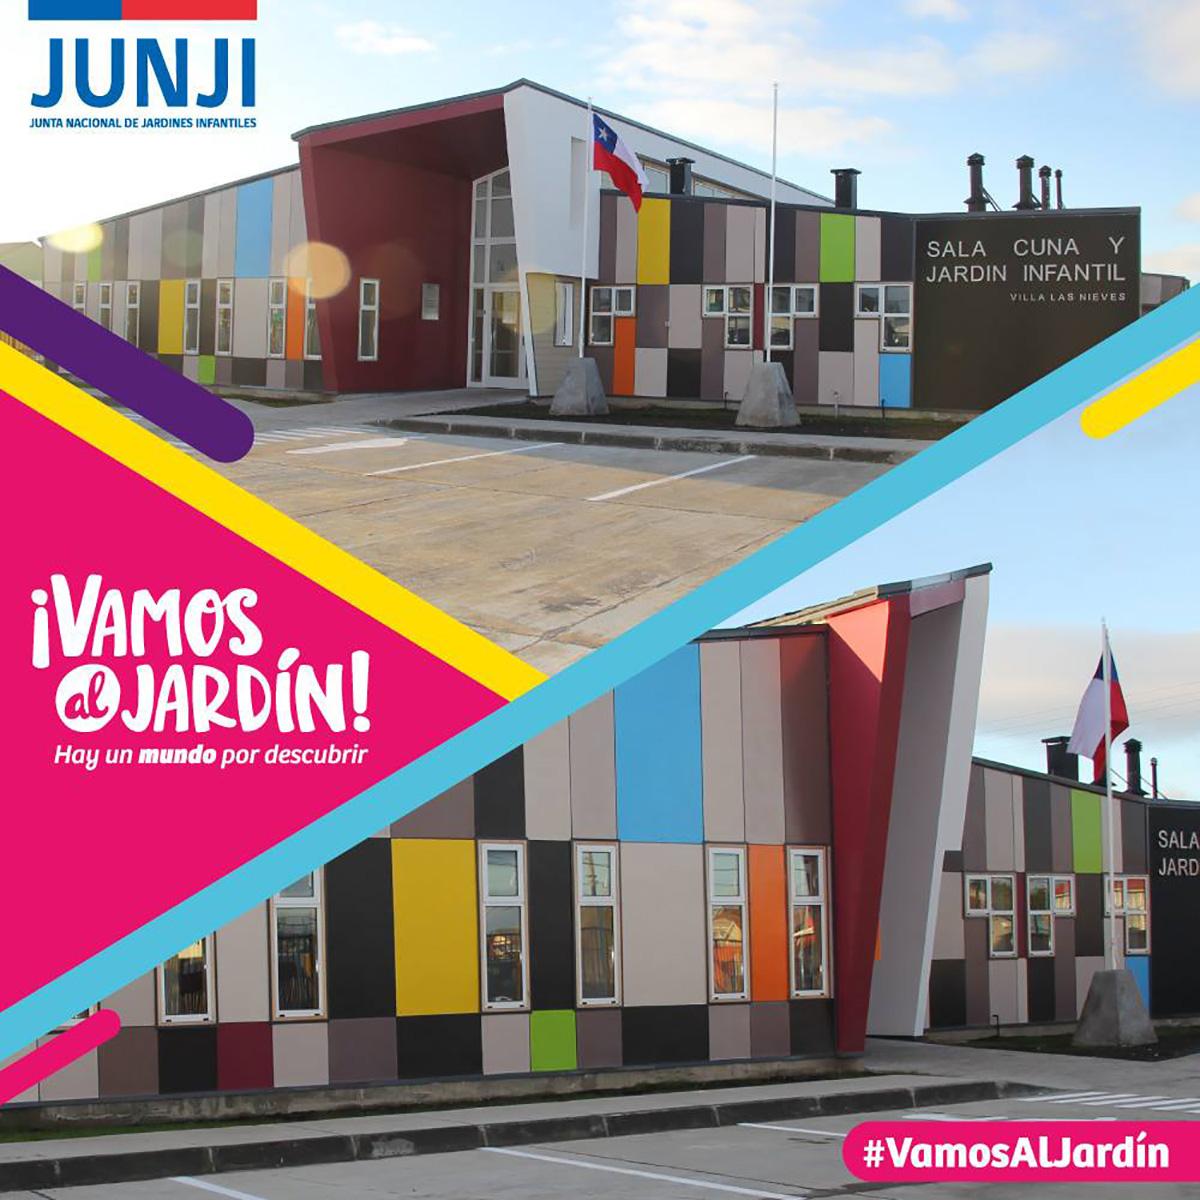 Ovejeronoticias junji magallanes inaugura dos modernos for Postulacion jardin junji 2016